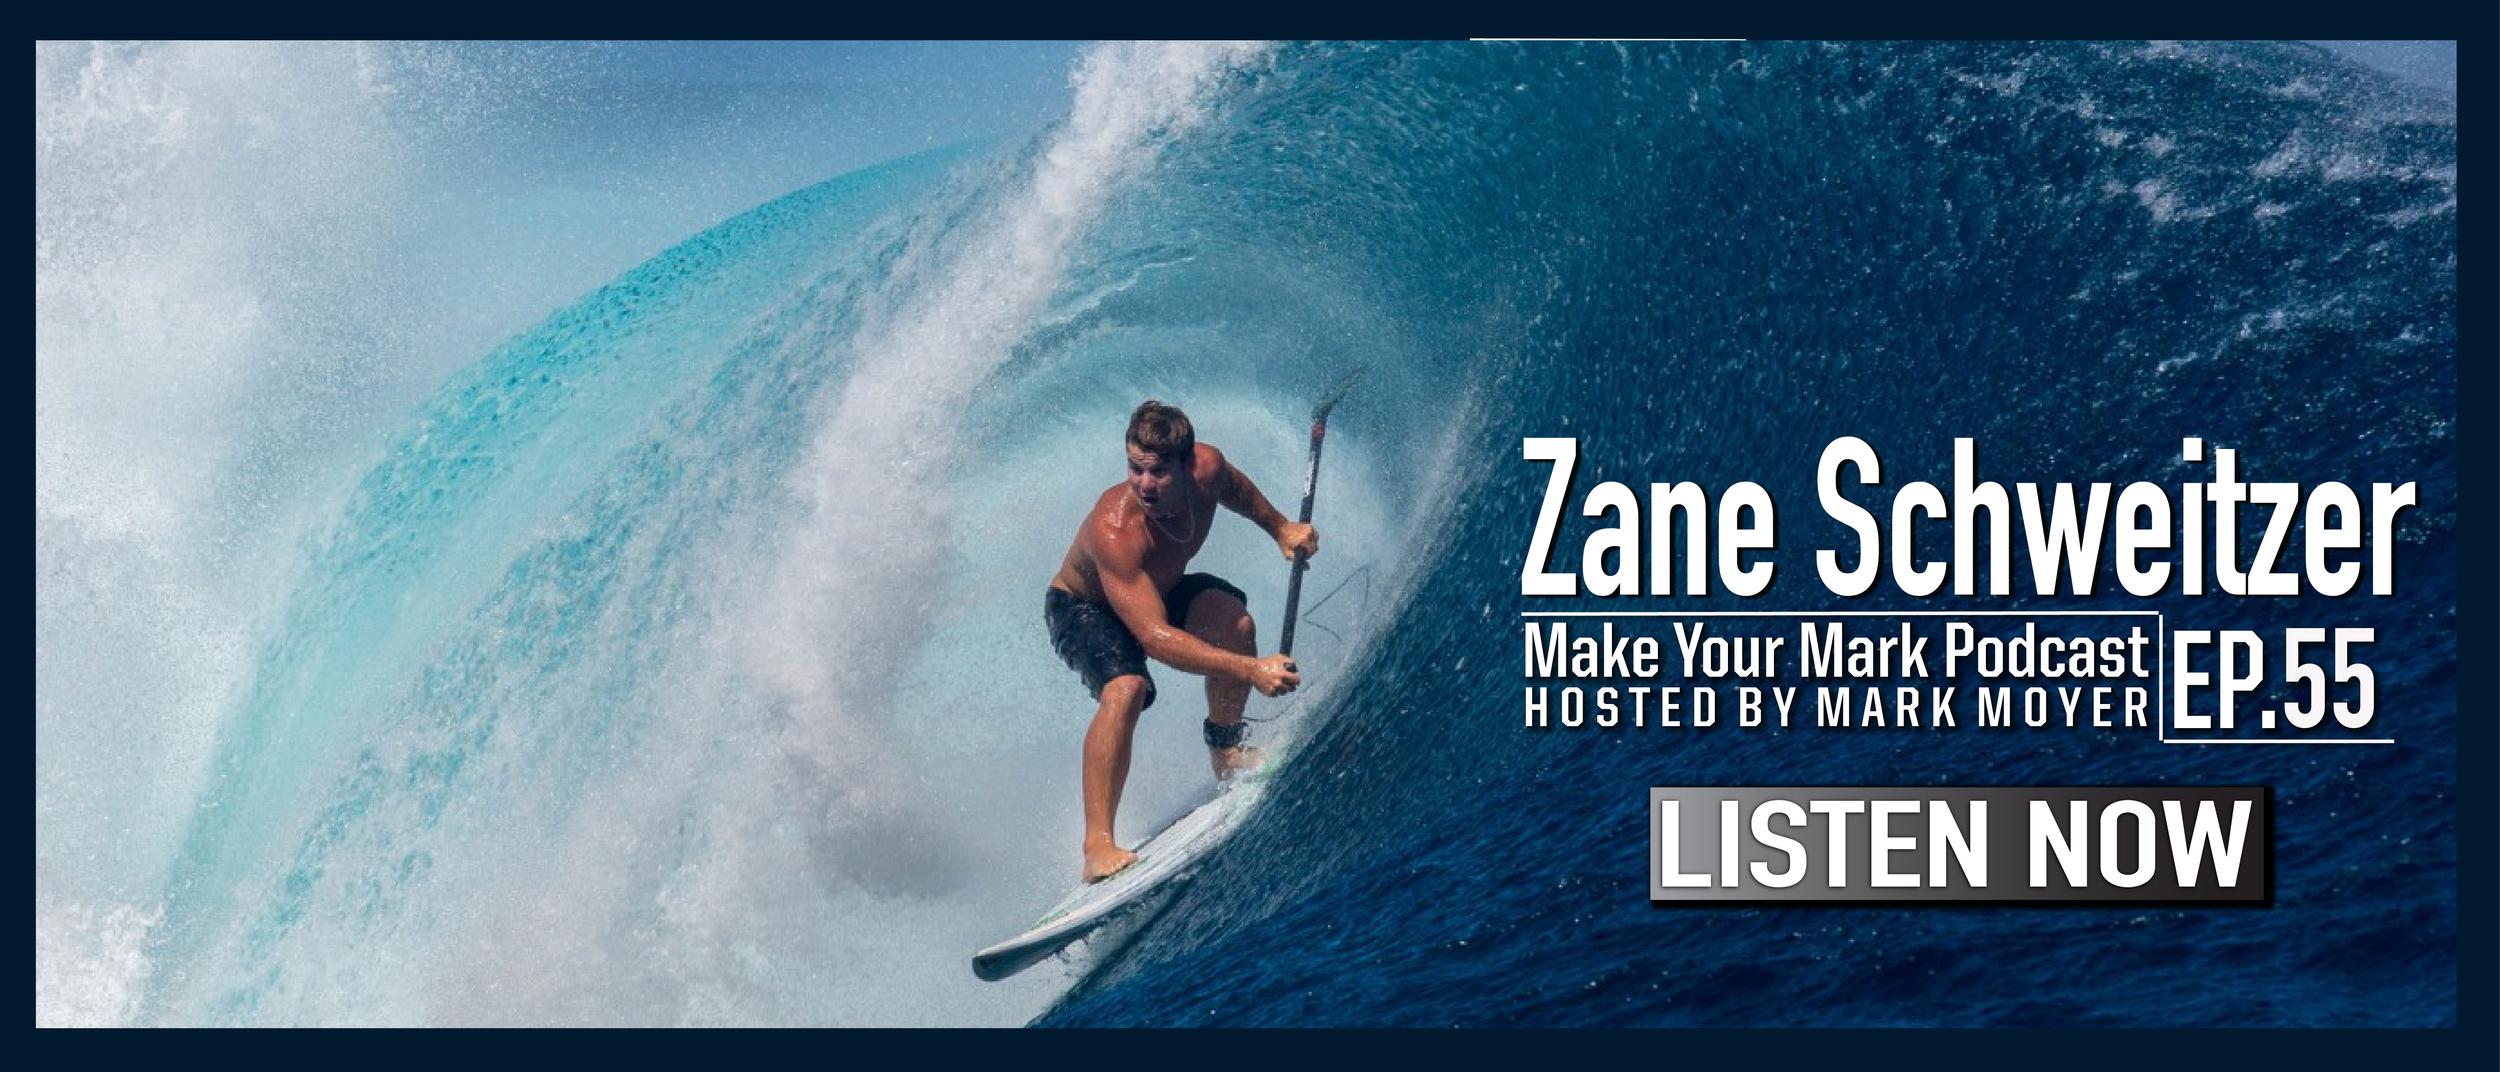 Zane listennow-04.png